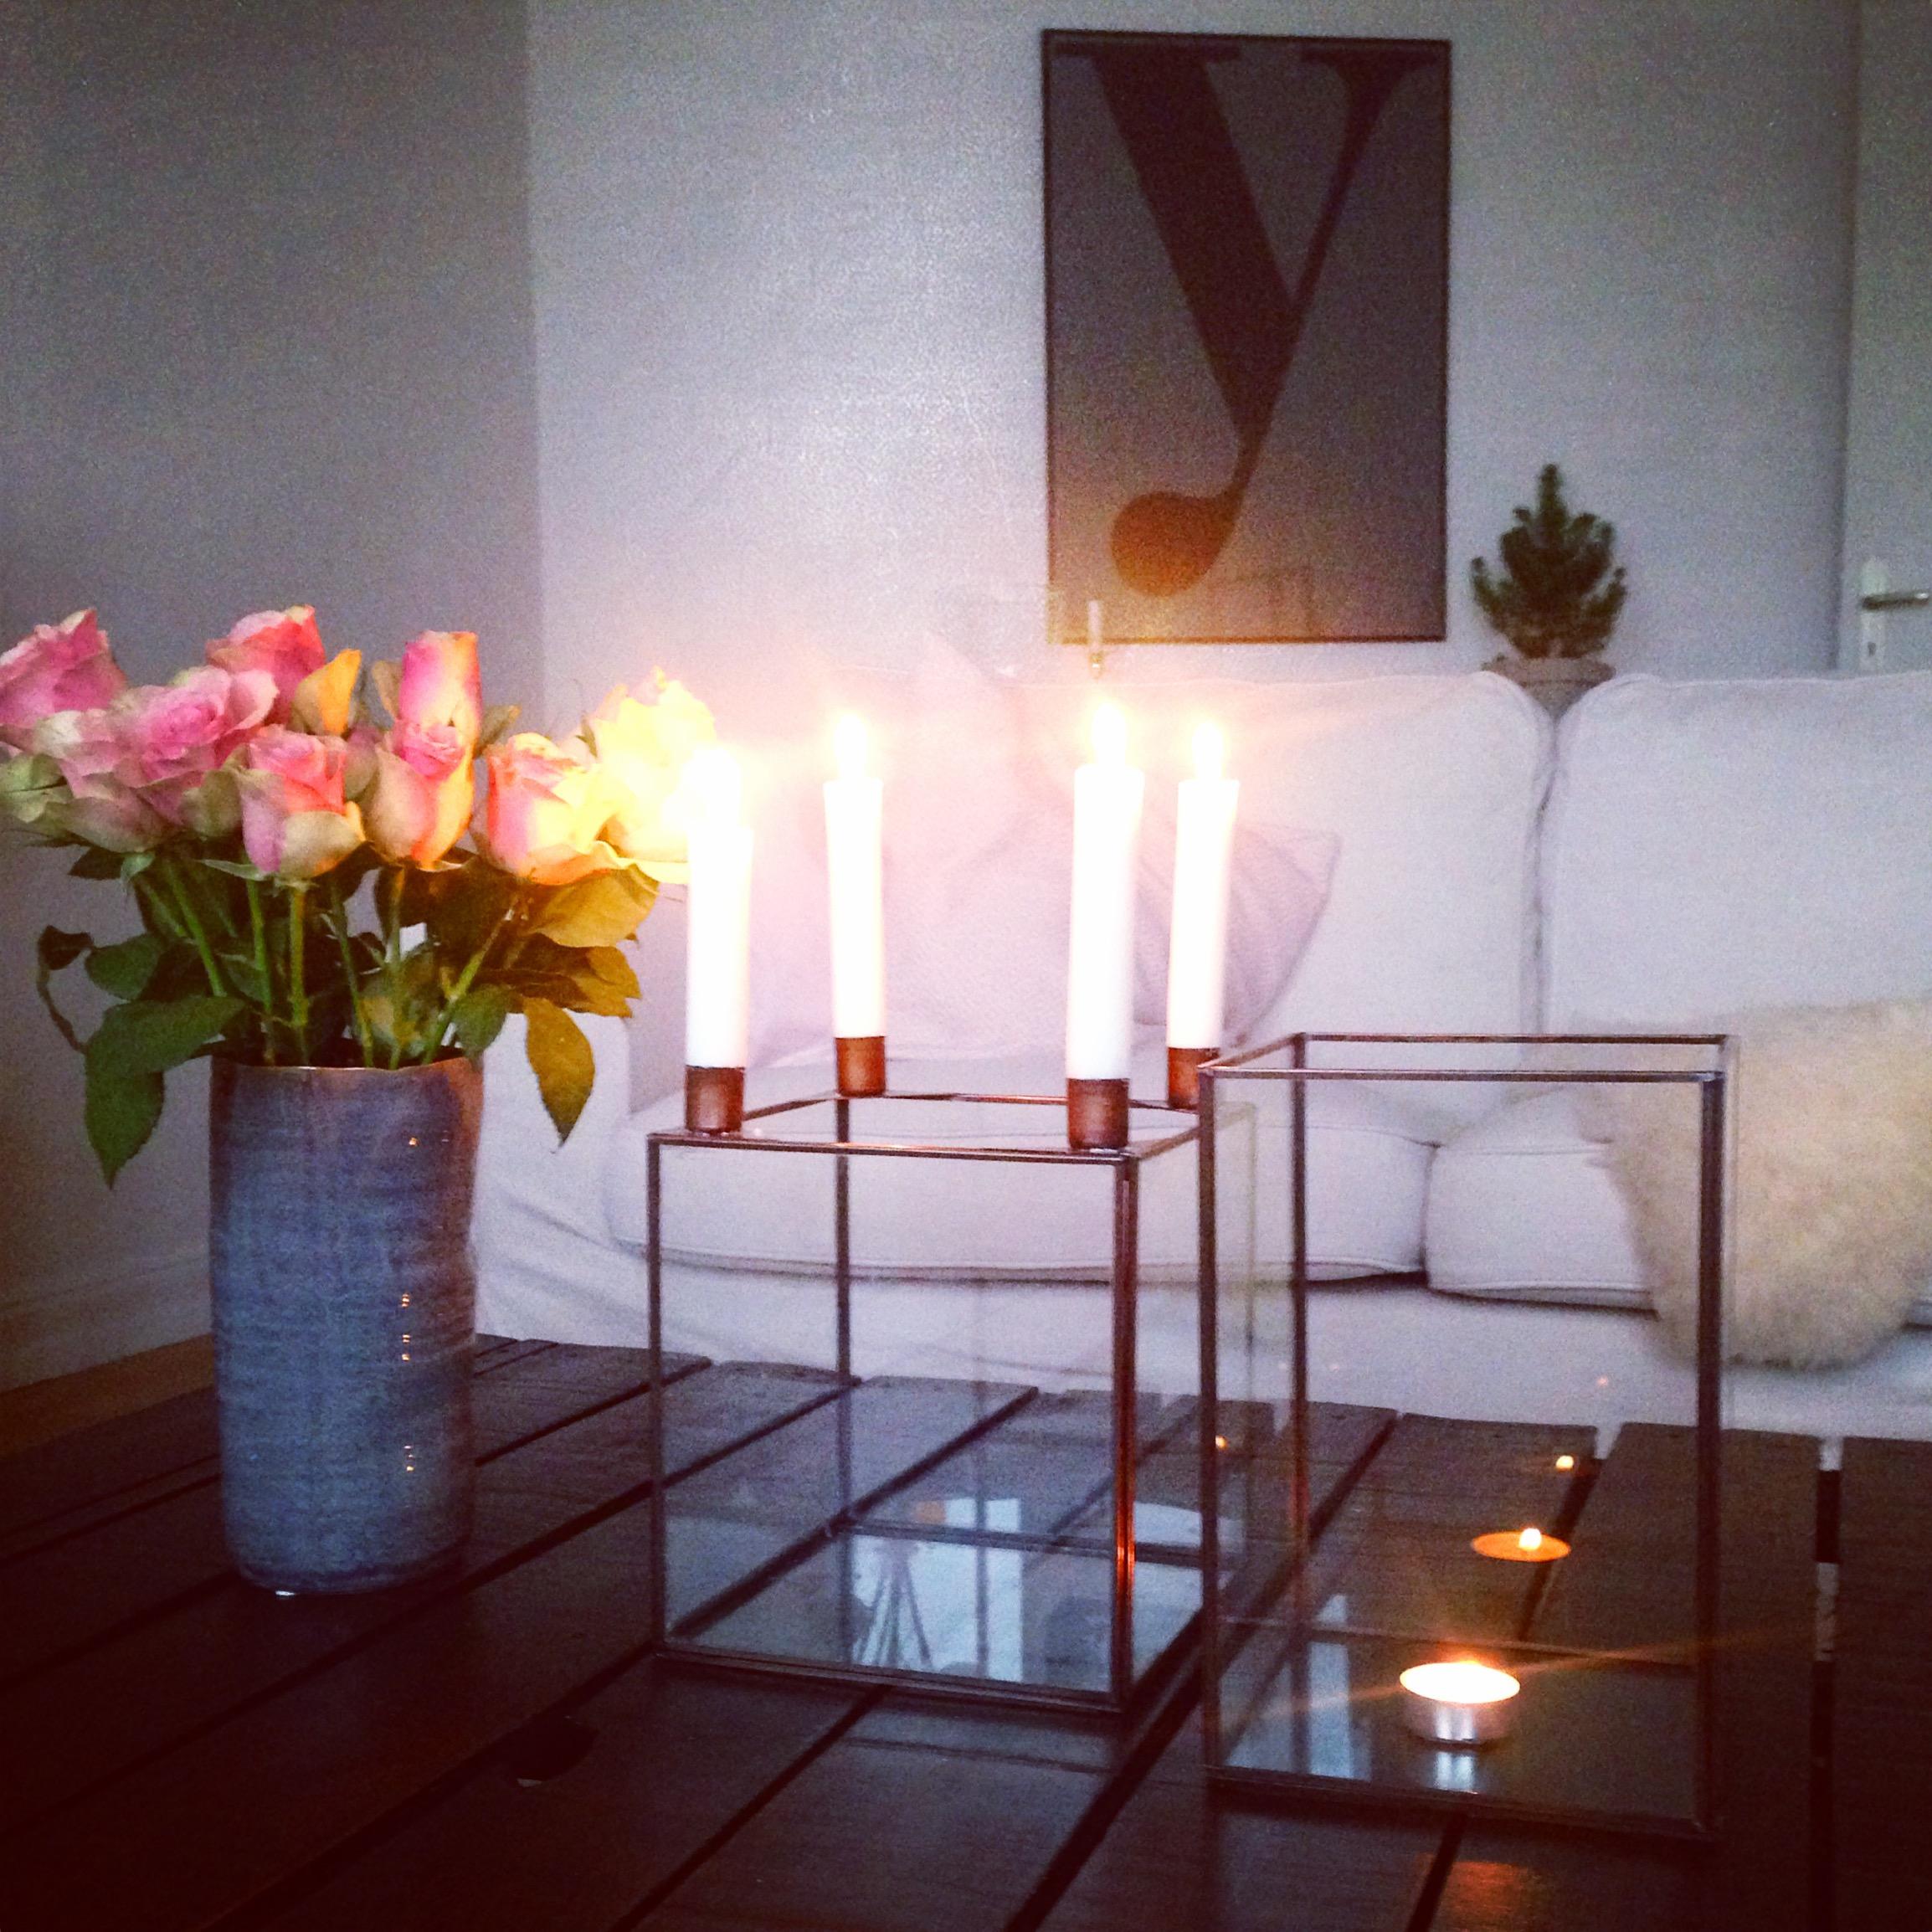 vierter Advent Kerzen